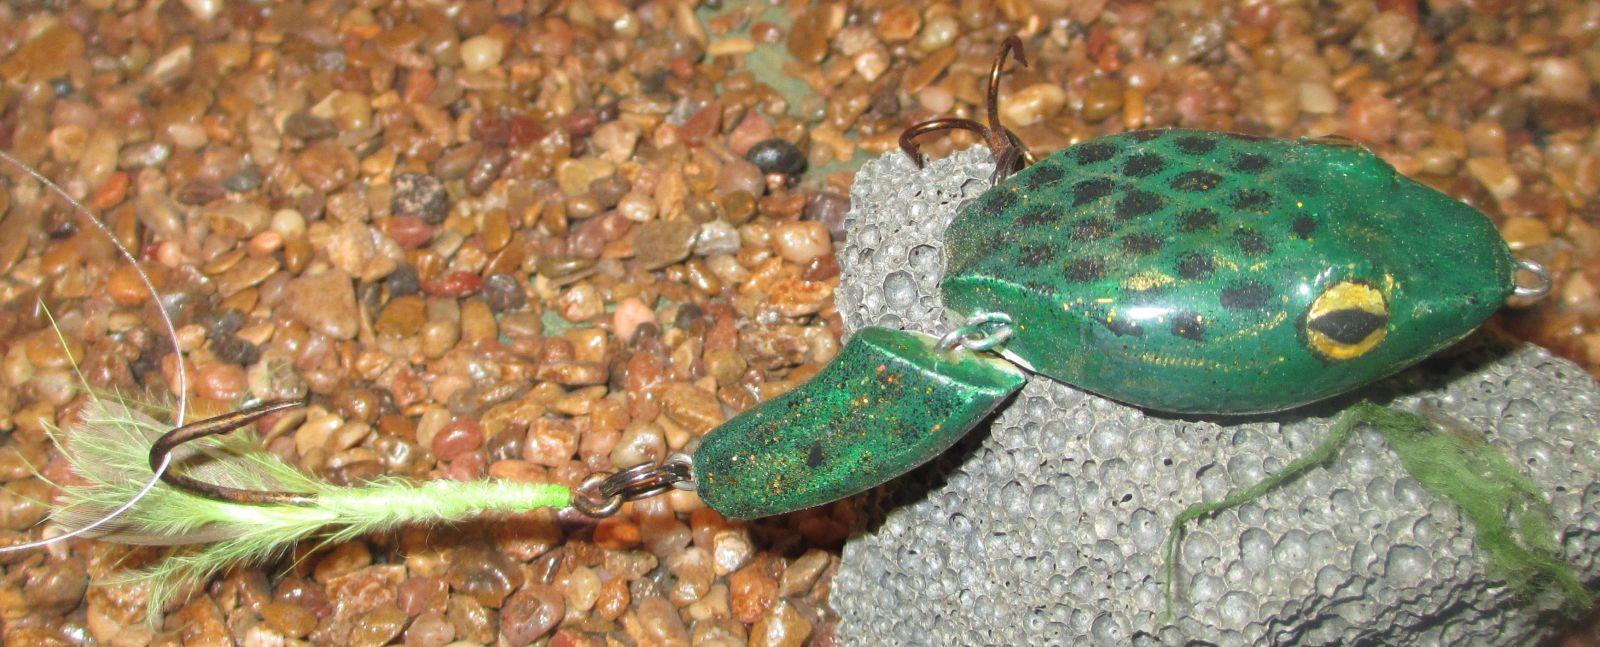 Hinged frog